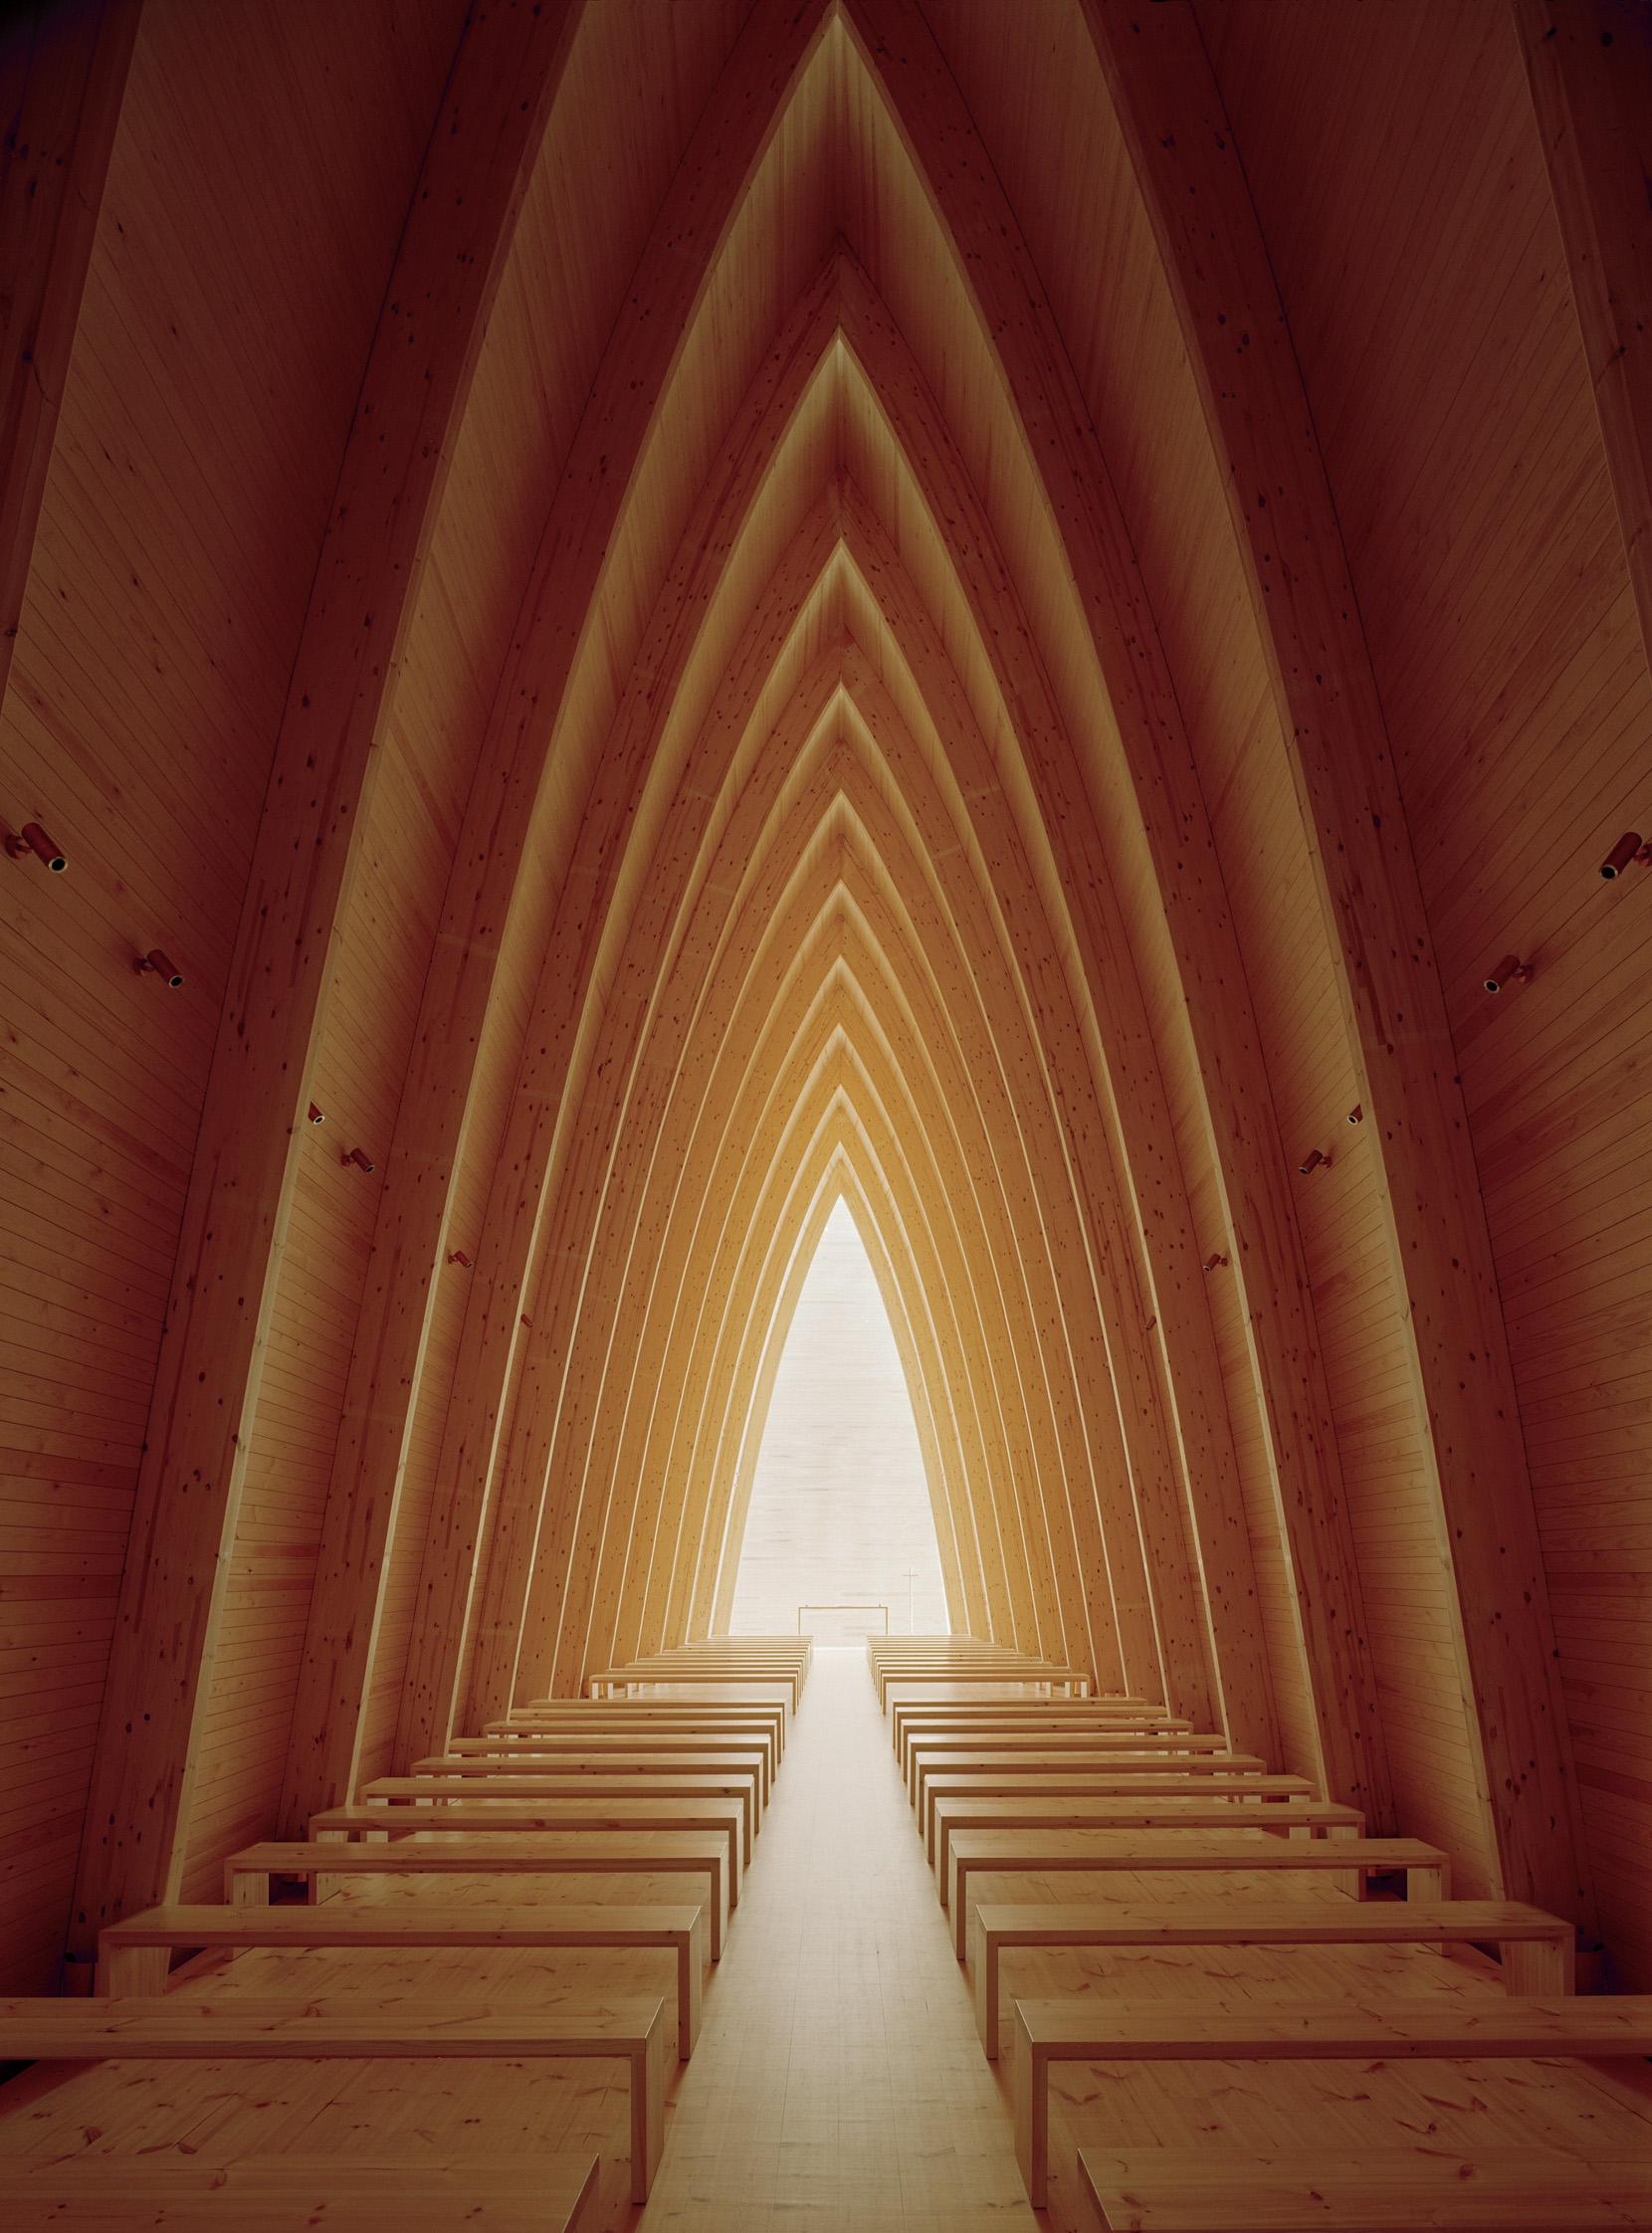 Sanaksenaho Architects: Turku Ecumenical Art Chapel designed 1996-99, built 2005. Photo: Jussi Tiainen